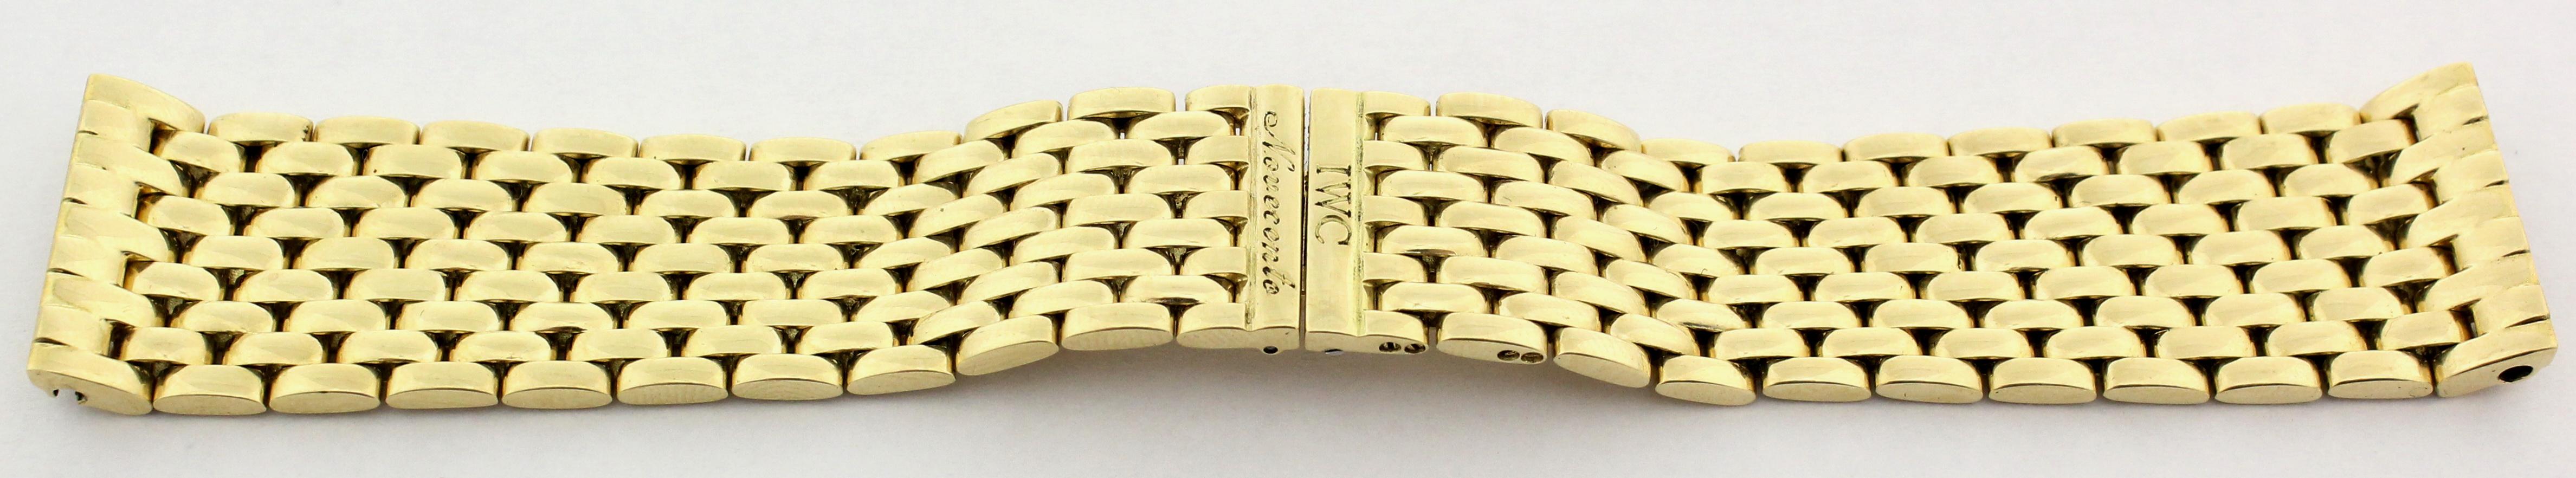 Armband Brustkrebs Charme Gold